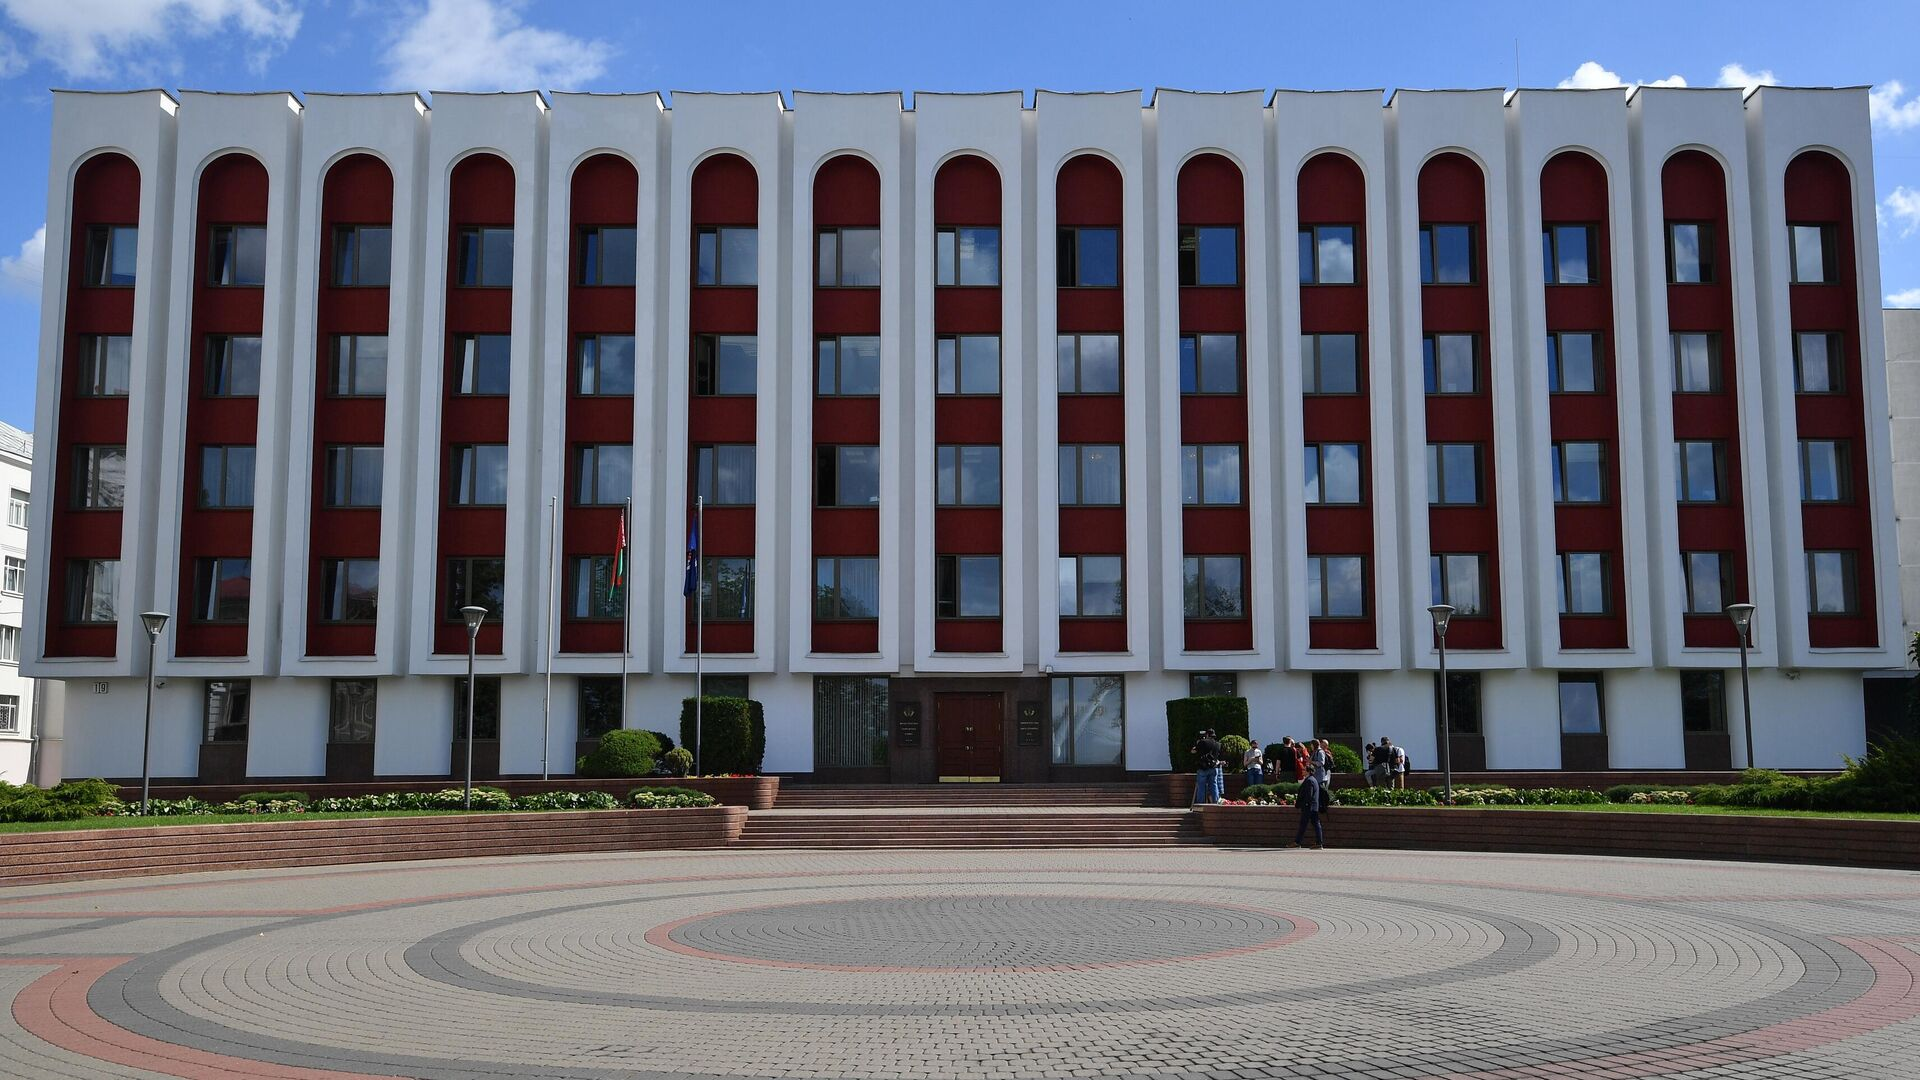 Здание МИД Белоруссии в Минске - РИА Новости, 1920, 24.09.2020